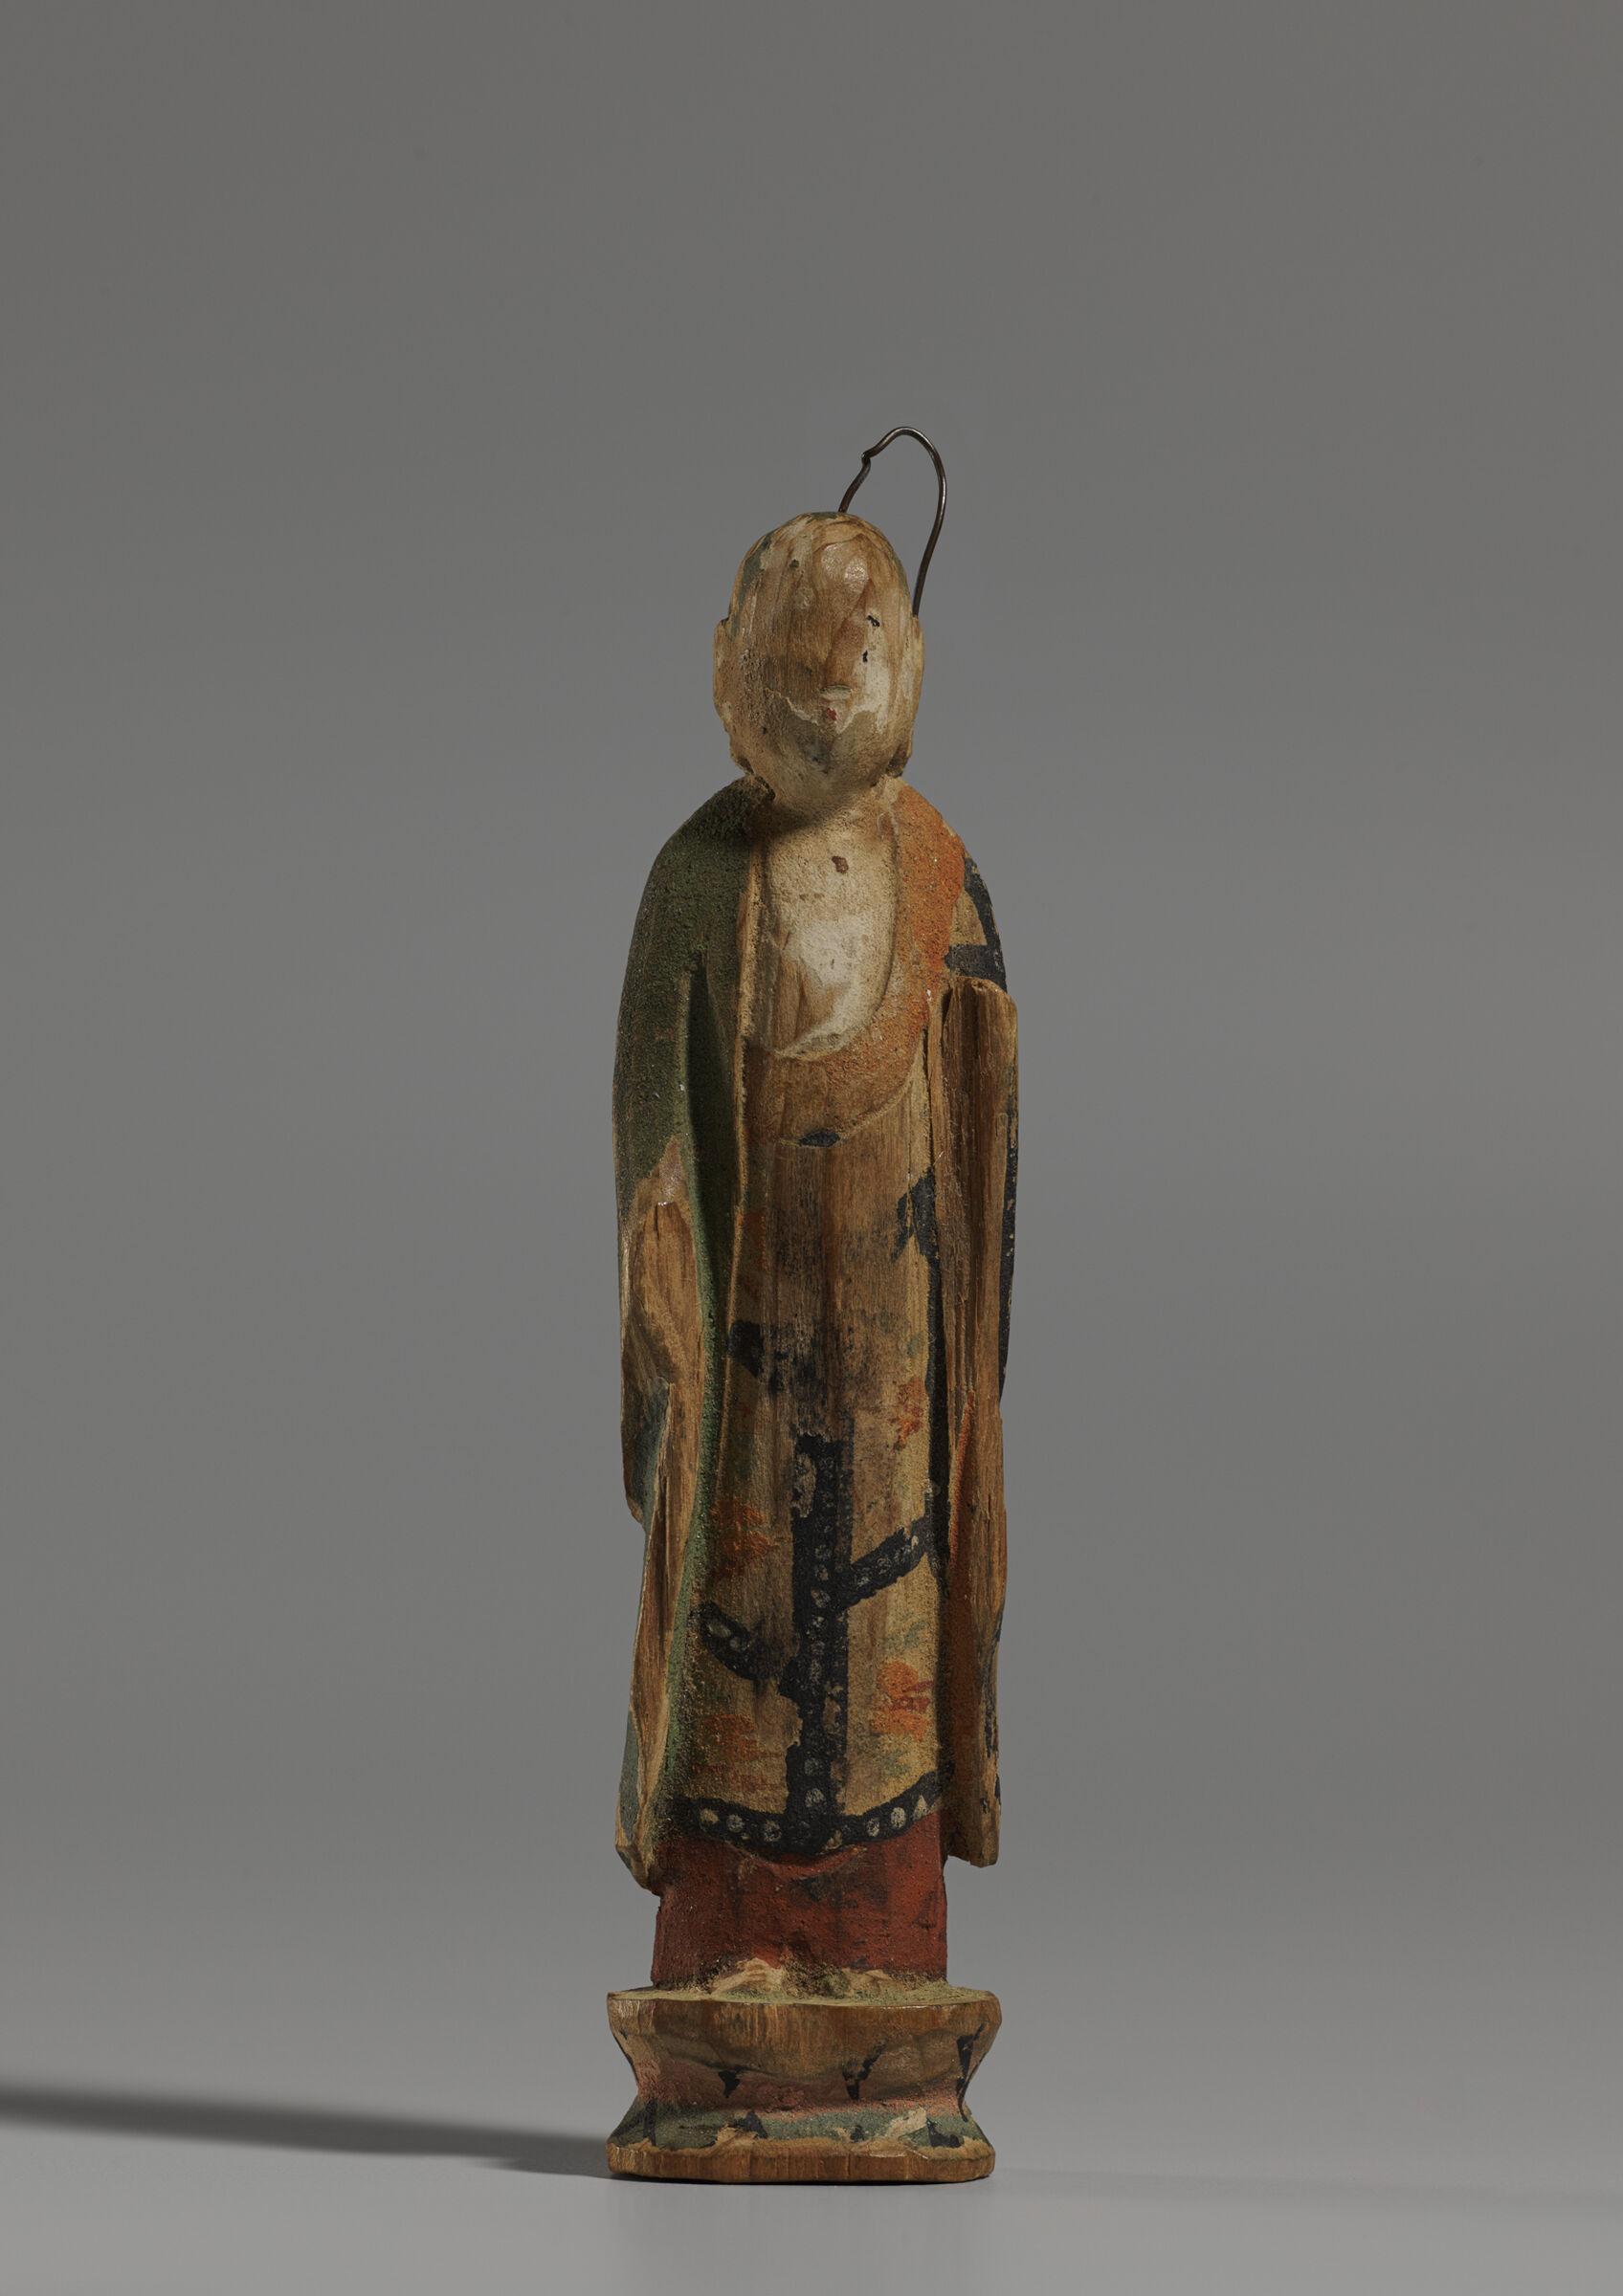 Small Image Of Bodhisattva Ksitigarbha (Japanese: Jizō Bosatsu)